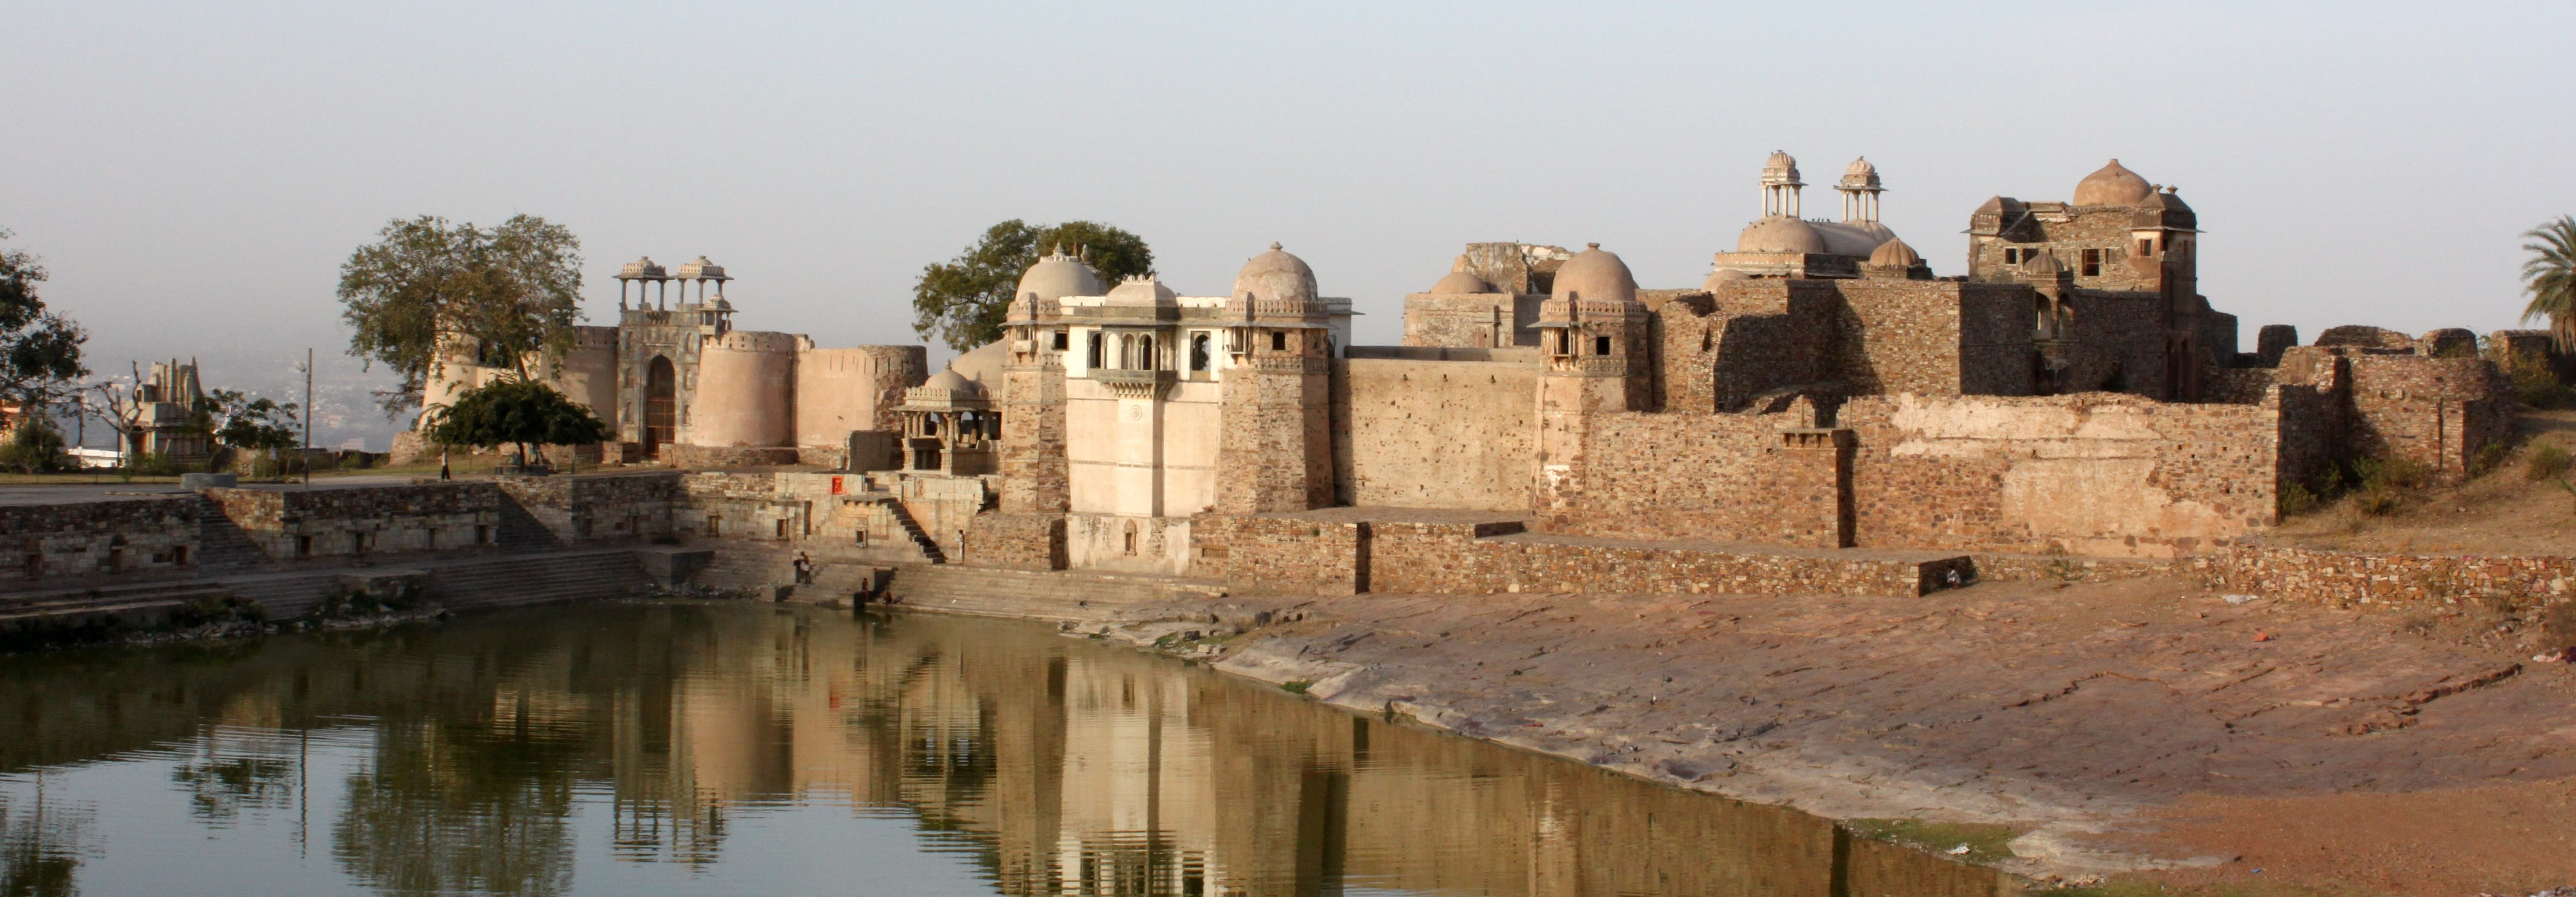 Ratan Singh Palace 1